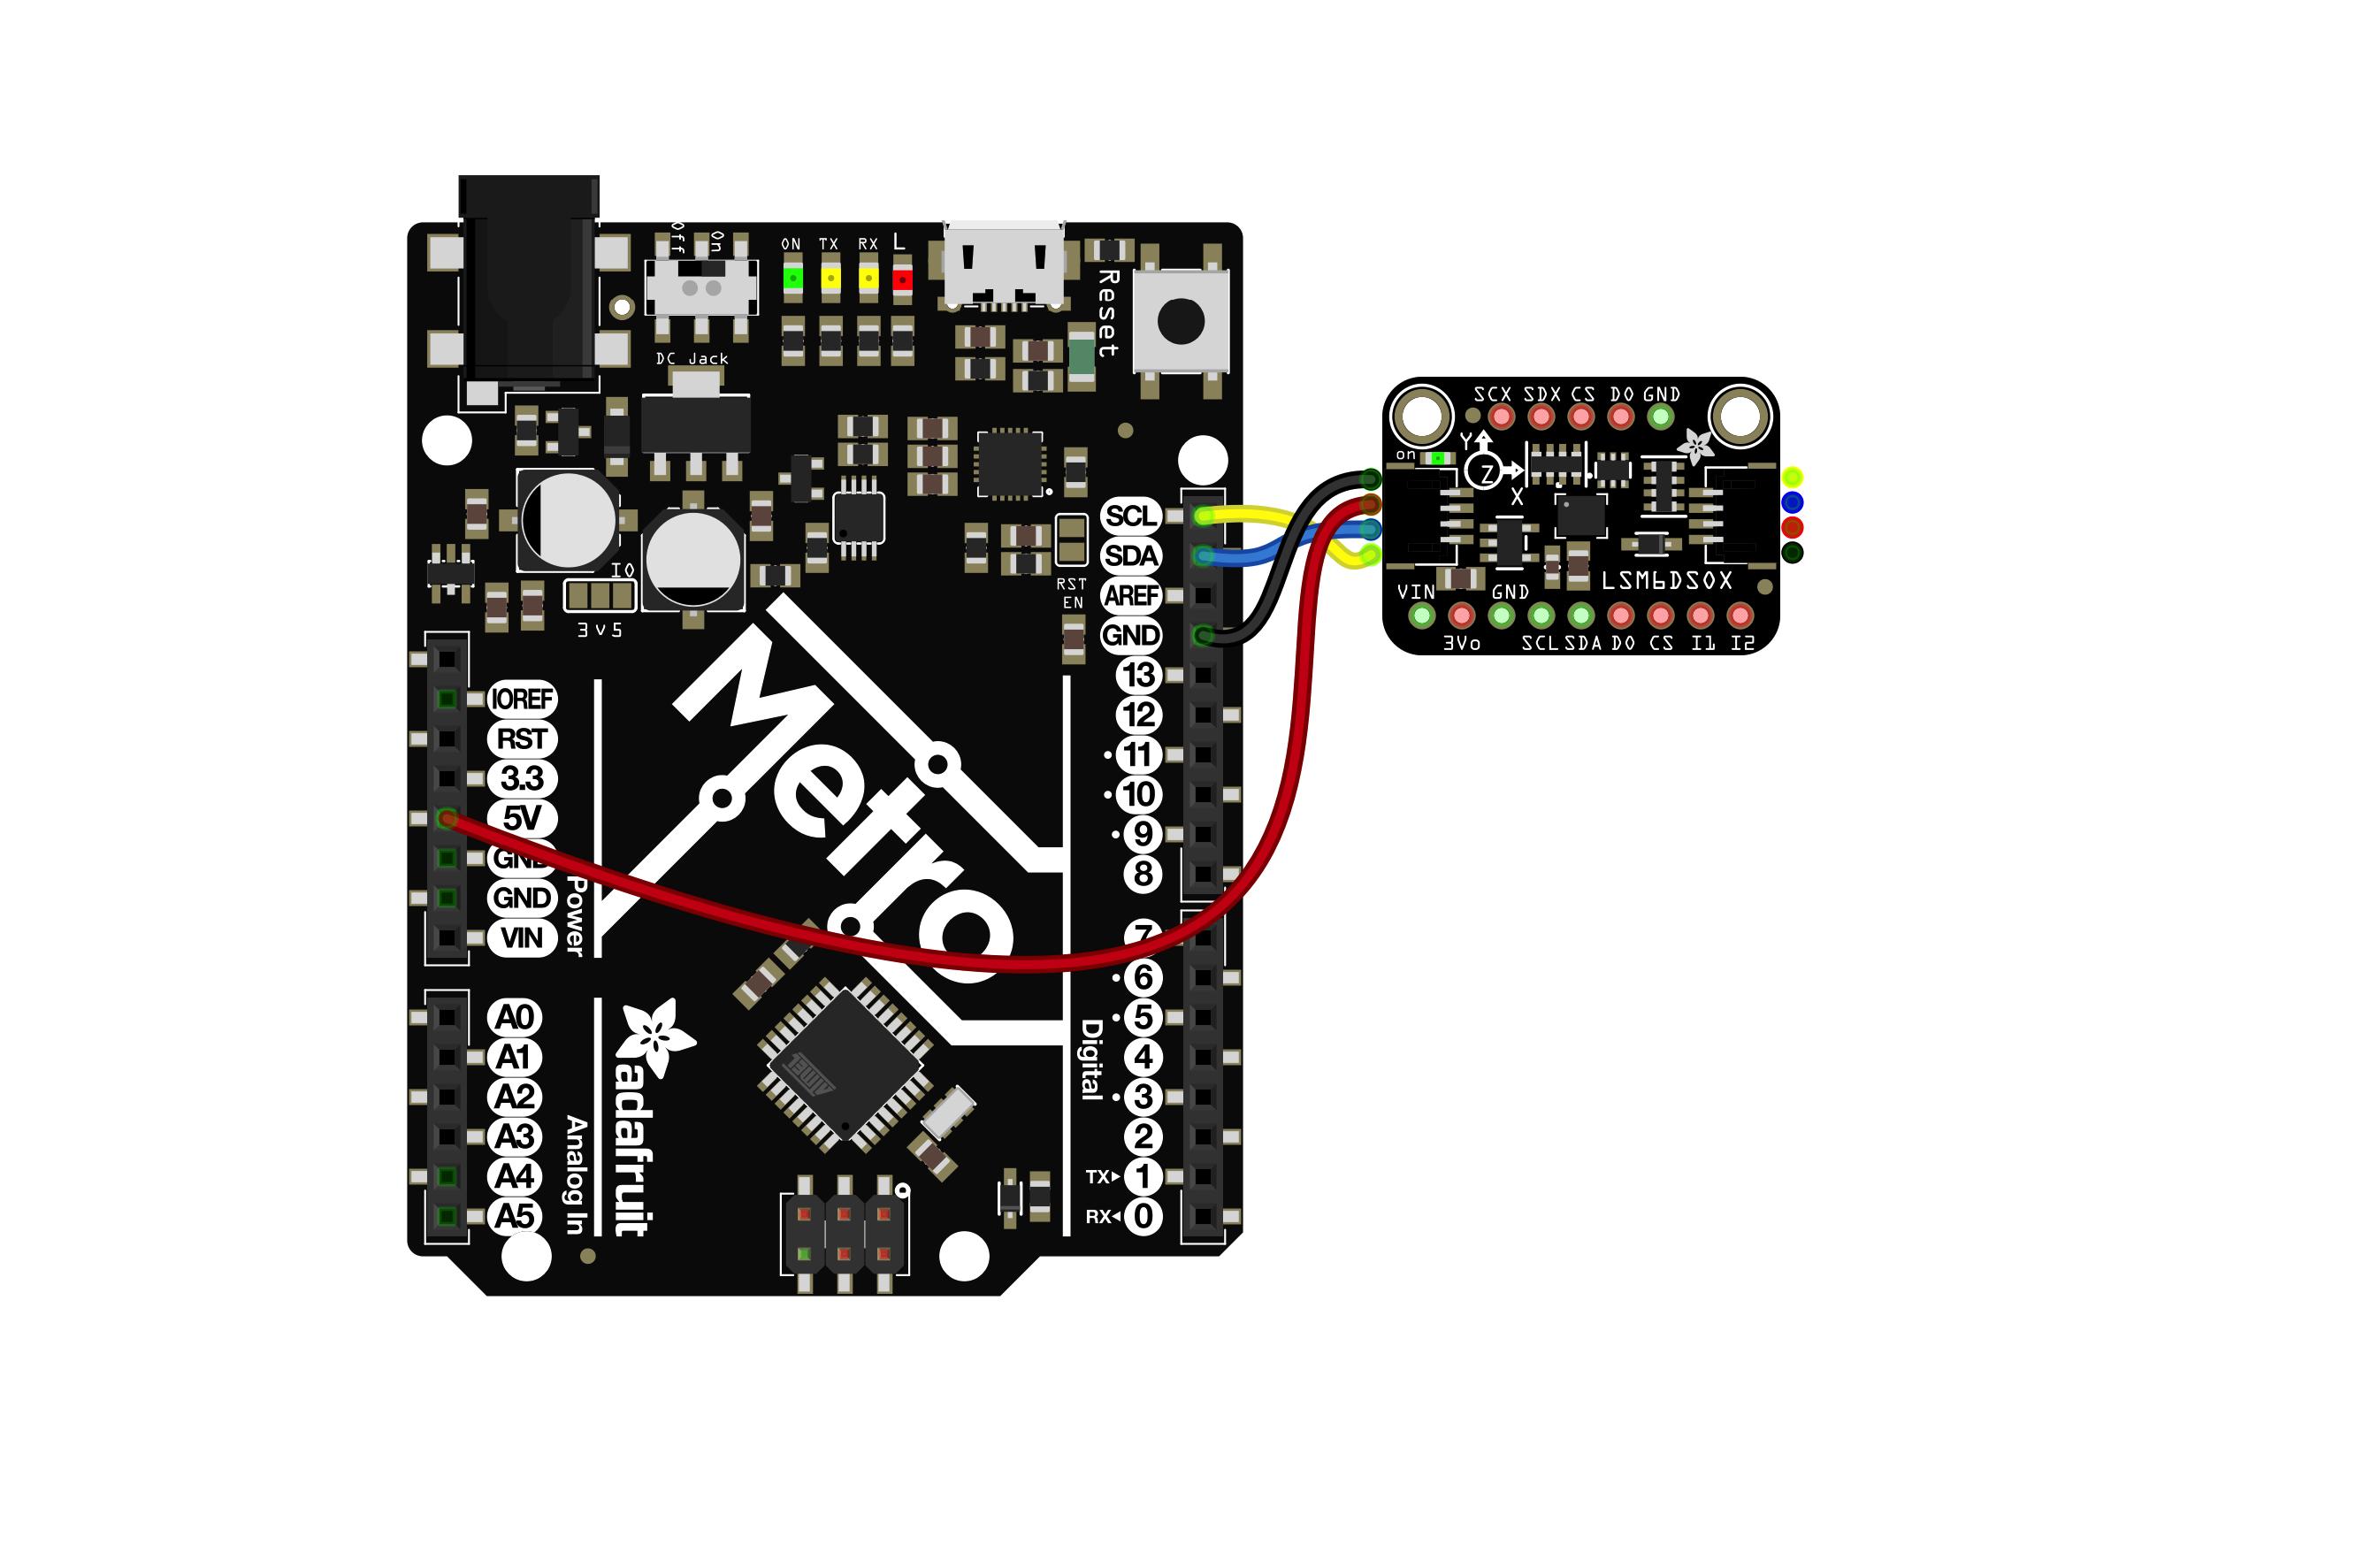 sensors_arduino_wiring_qt.png